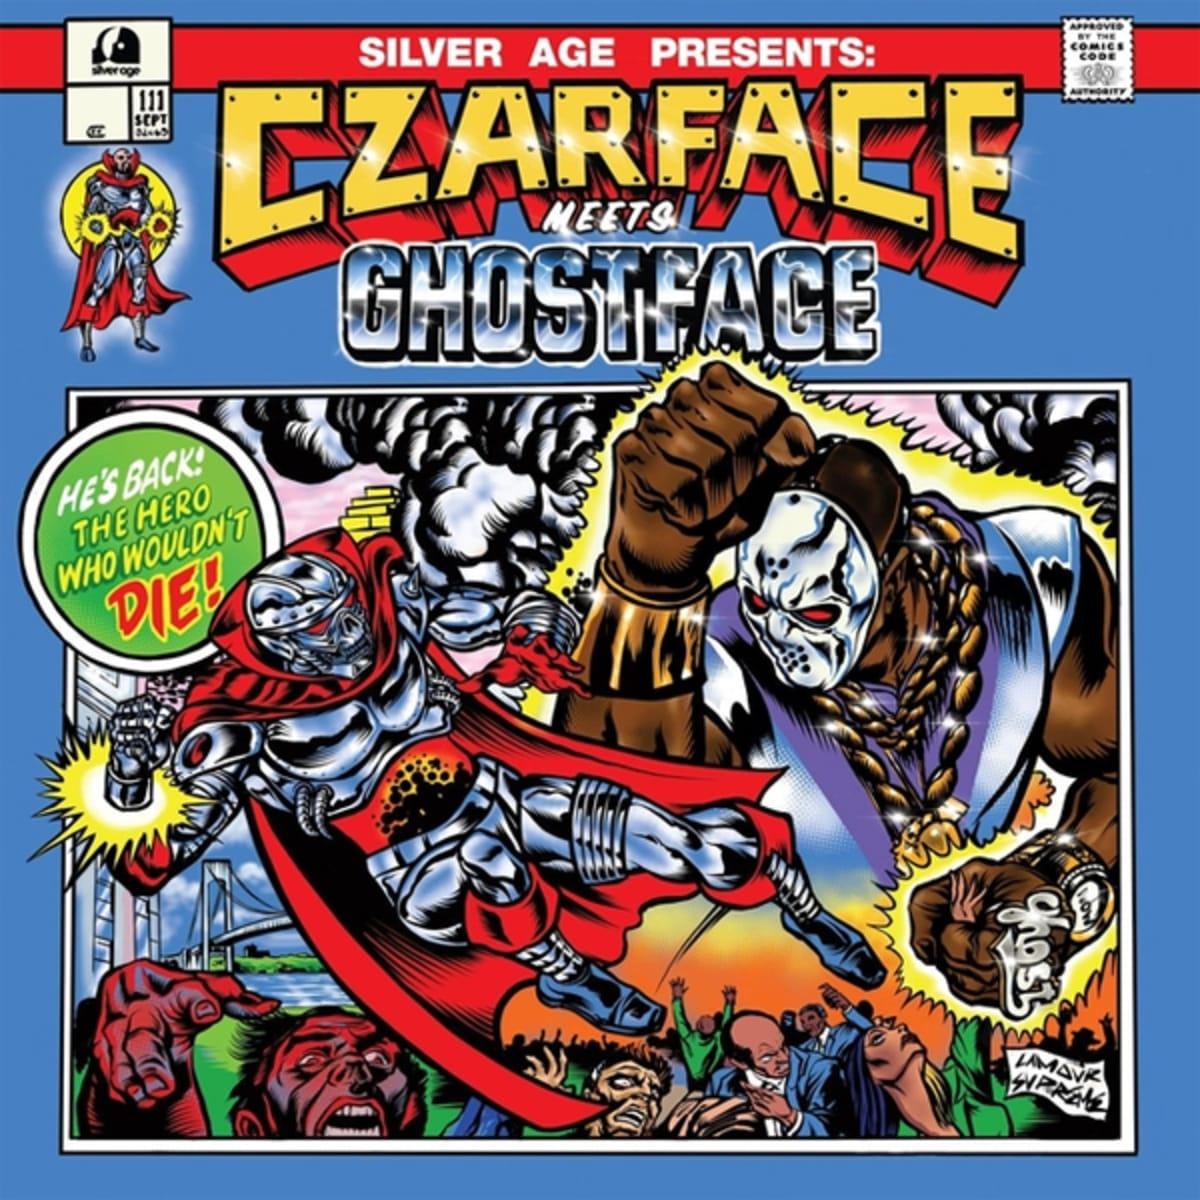 Czarface Drop Ghostface Killah Collab Album 'Czarface Meets Ghostface'